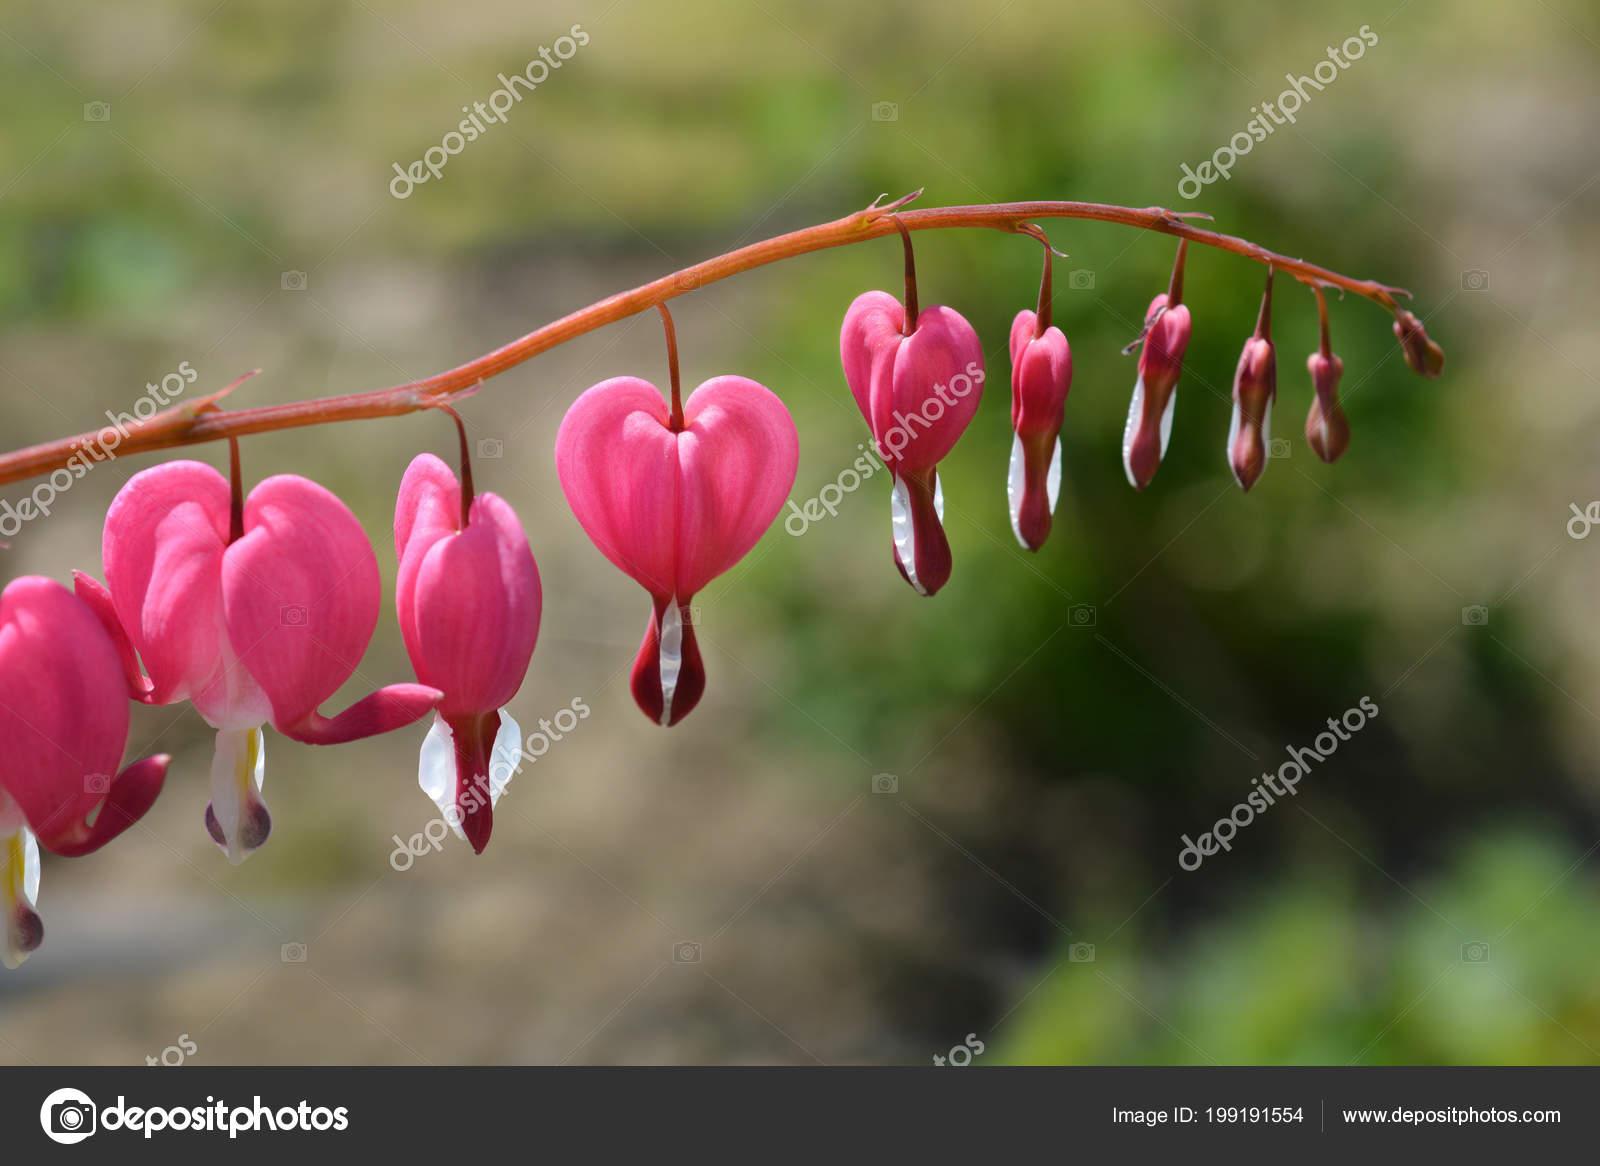 Bleeding Heart Pink Flowers Latin Name Lamprocapnos Spectabilis Old